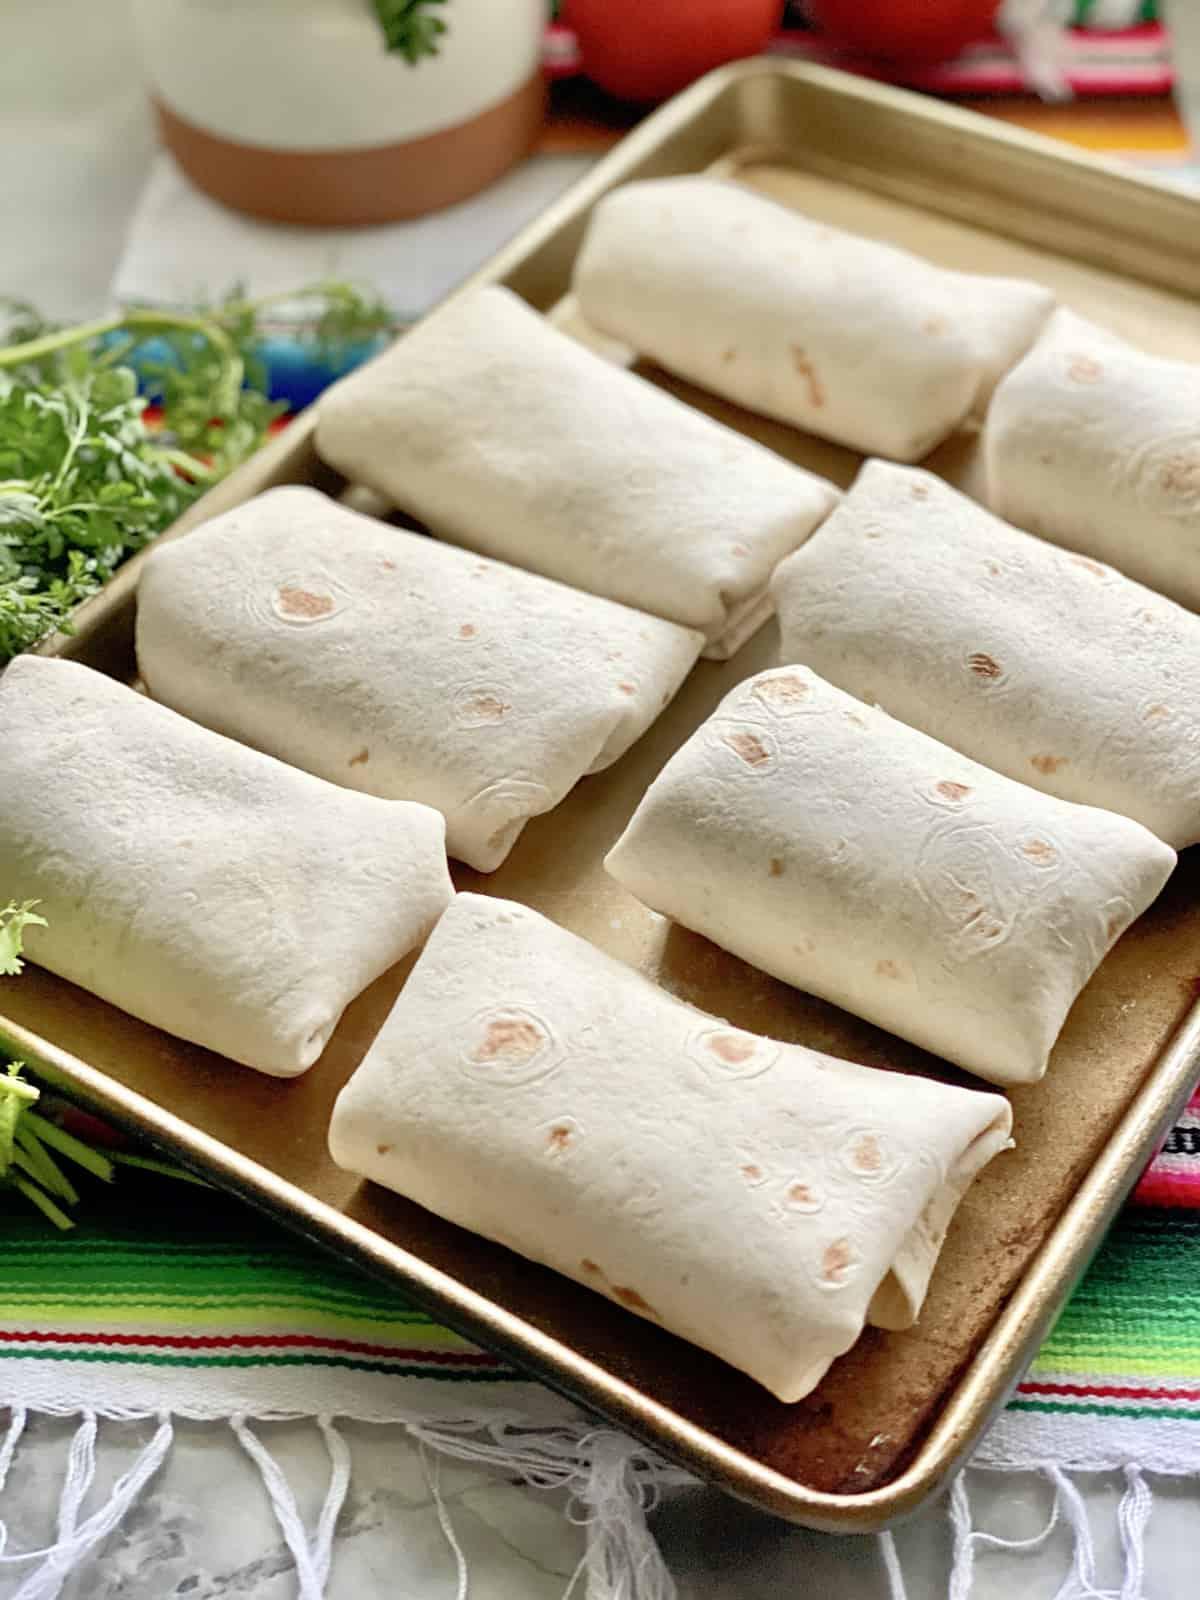 Baking sheet filled with 8 flour burritos.